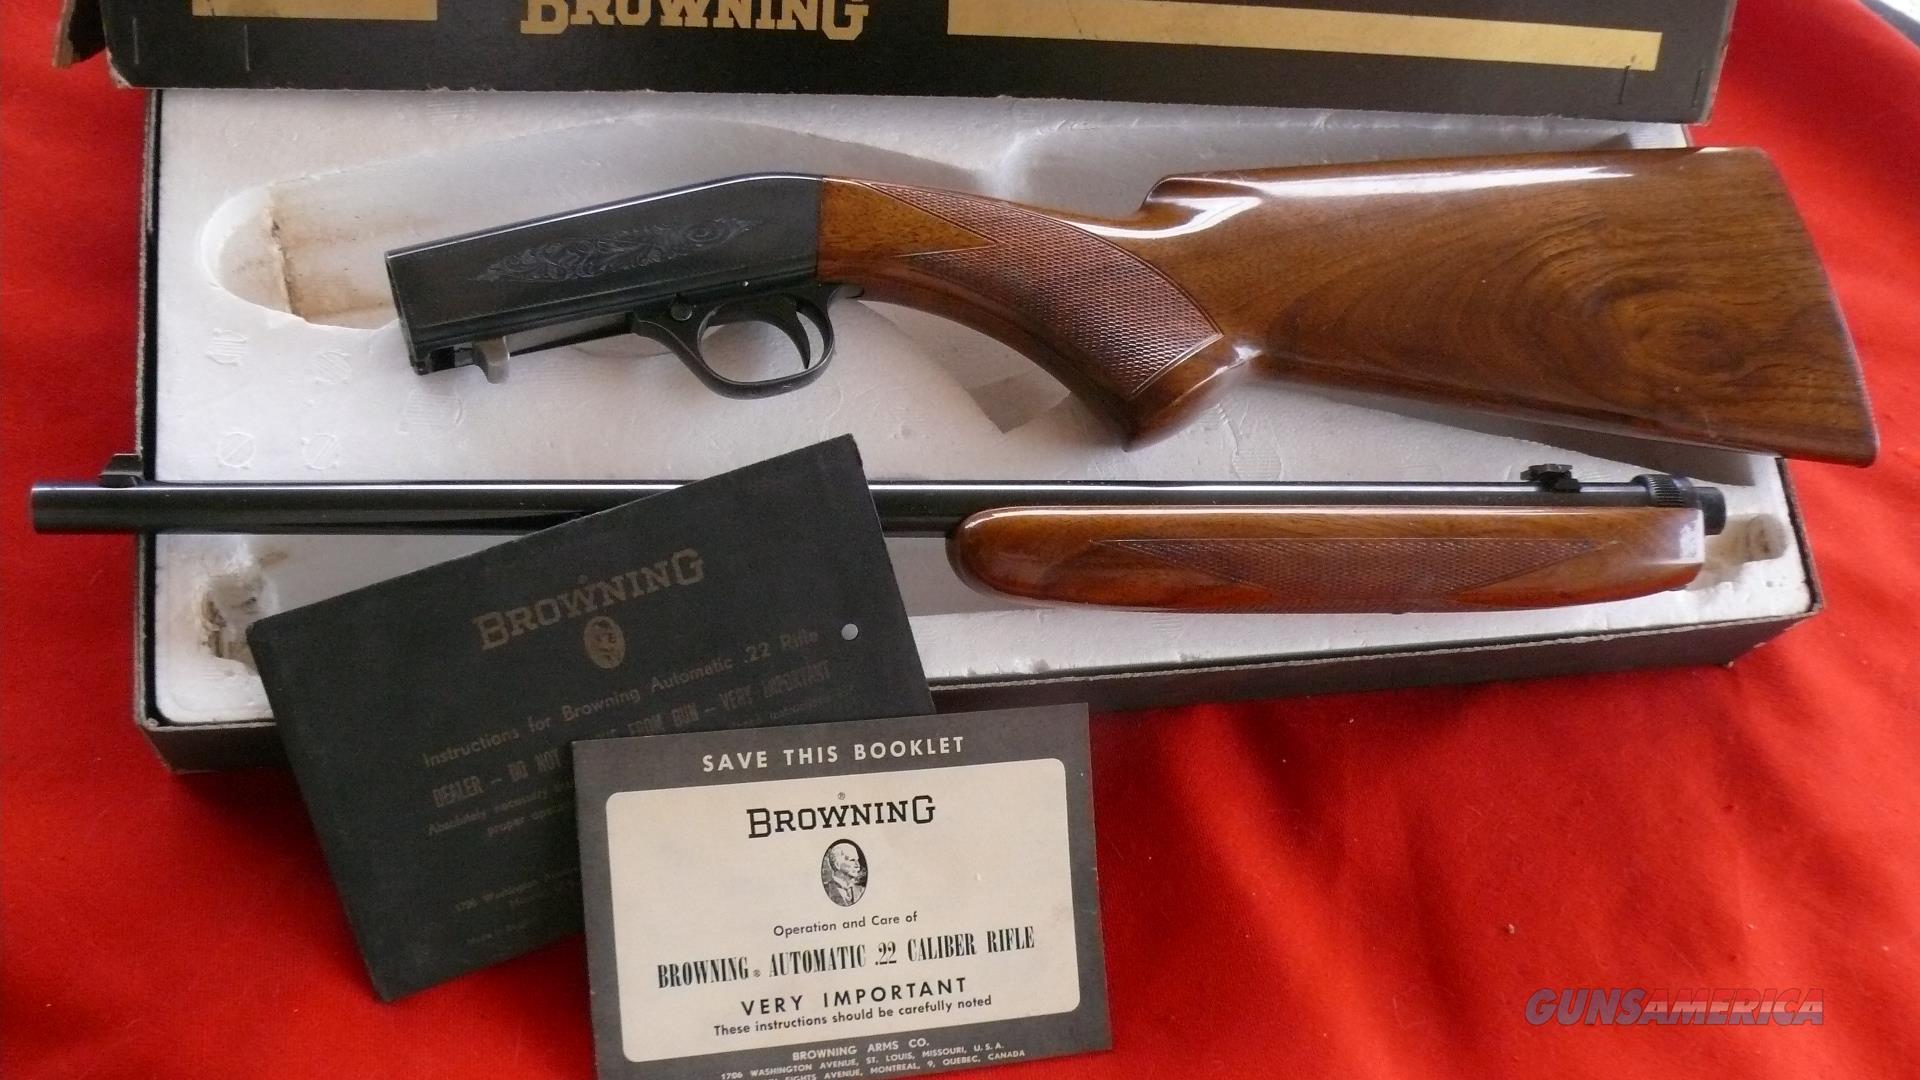 Belgian Browning 22 Auto Takedown LNIB  Exc .22LR in Box  Guns > Rifles > Browning Rifles > Semi Auto > Hunting